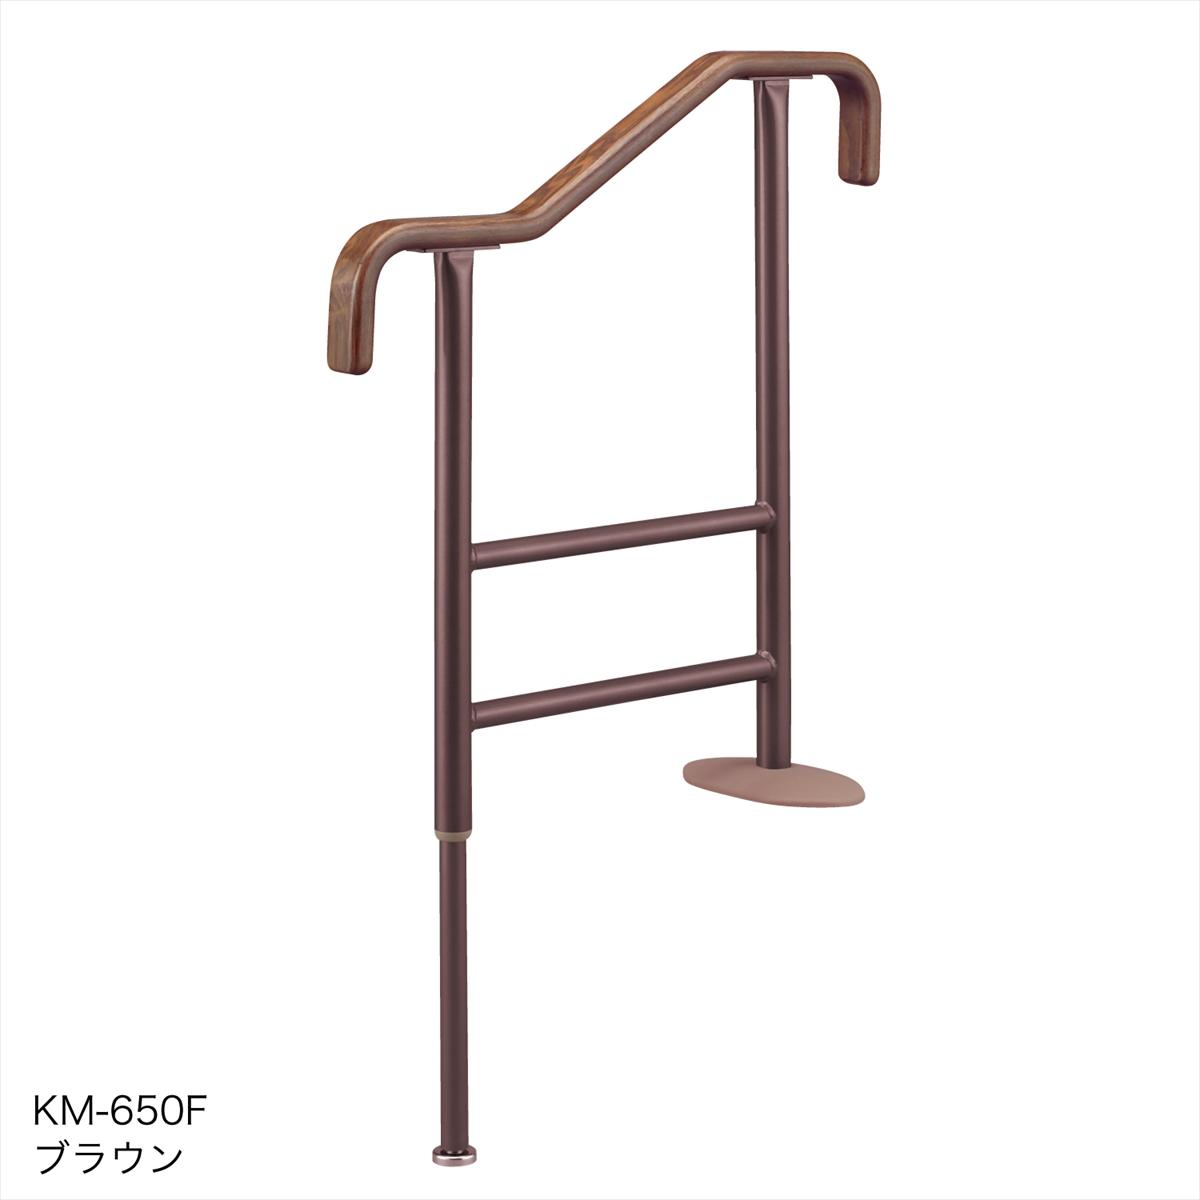 KM-650F 531-046 上がりかまち用手すり 531-048 フラット型固定板 [アロン化成]安寿